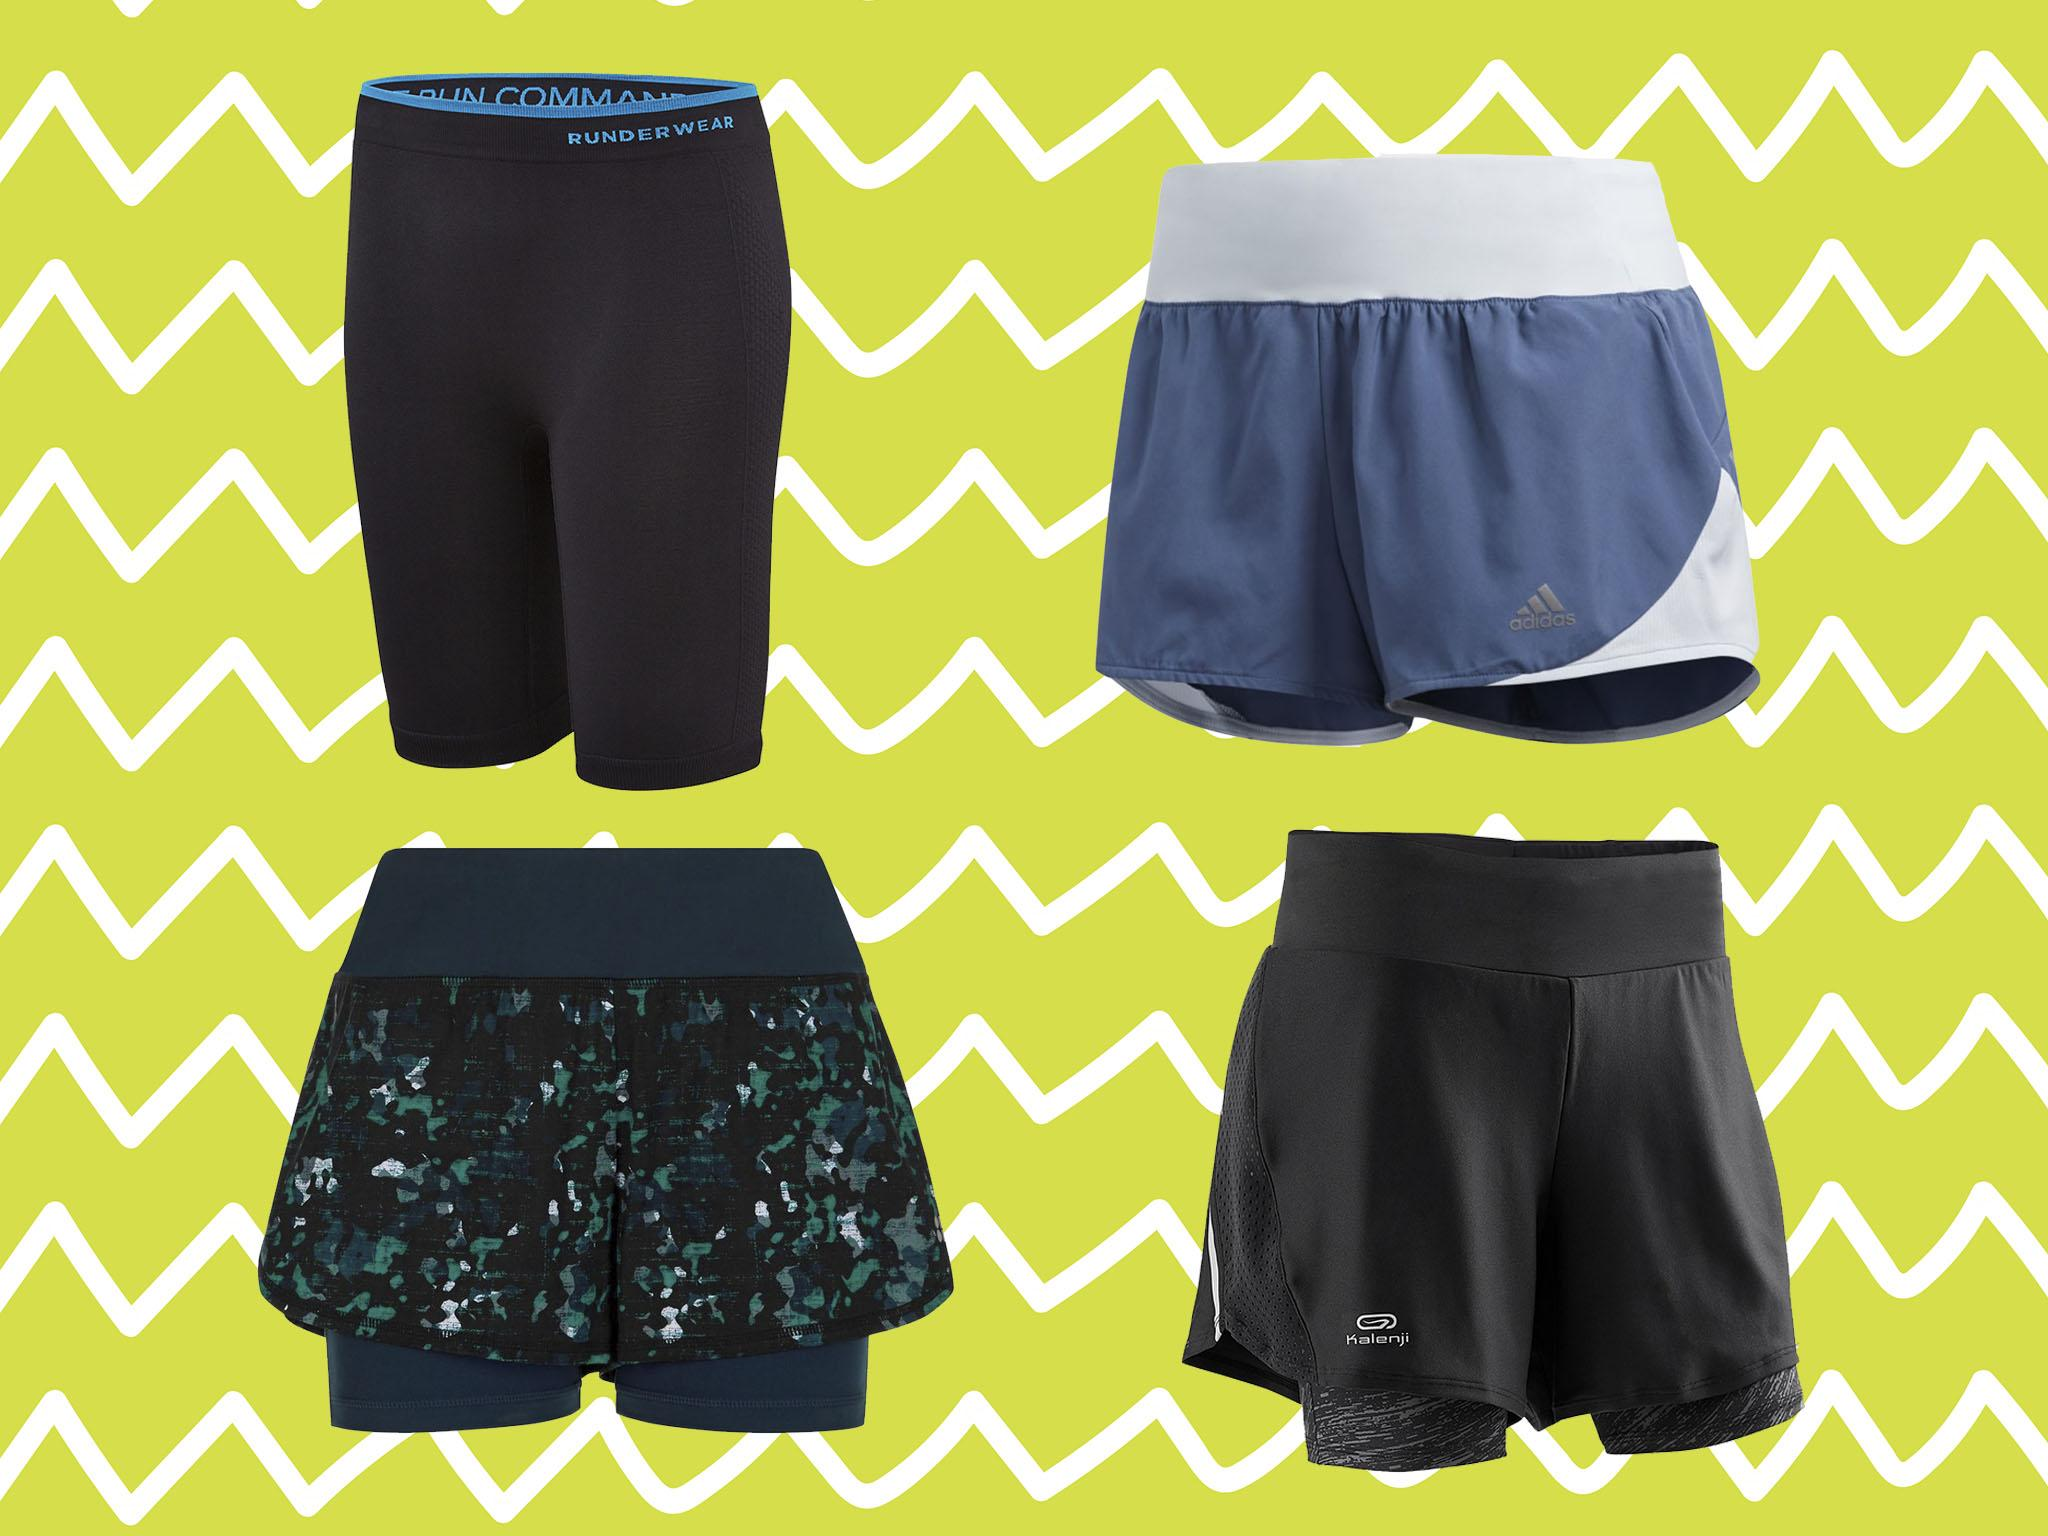 Men Liner Running Short Training Quick Drying Sports Shorts Pants 2 In 1 Summer